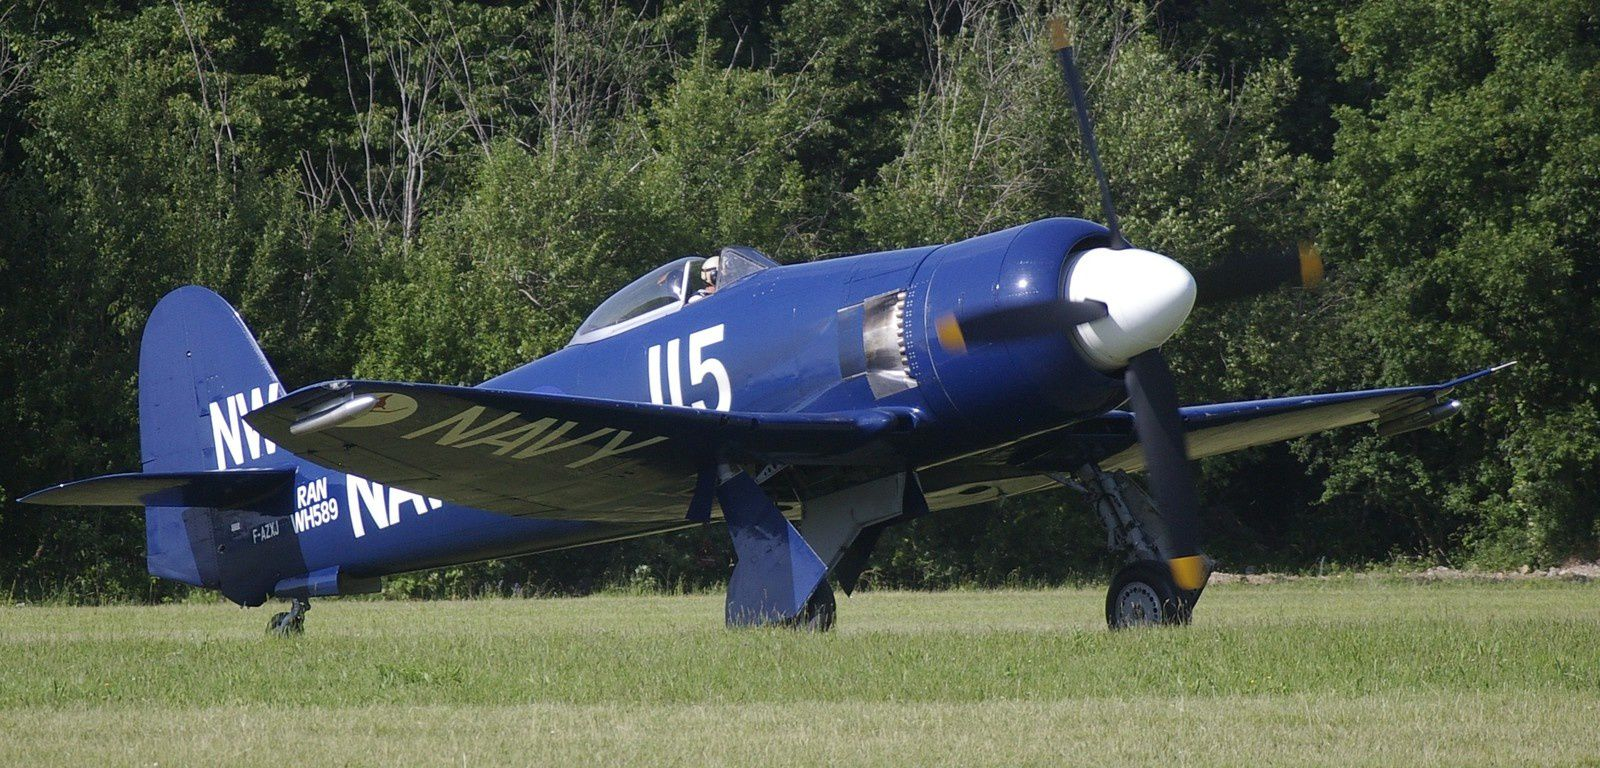 Le Hawker Sea Fury de Christophe Jacquard, basé à Dijon